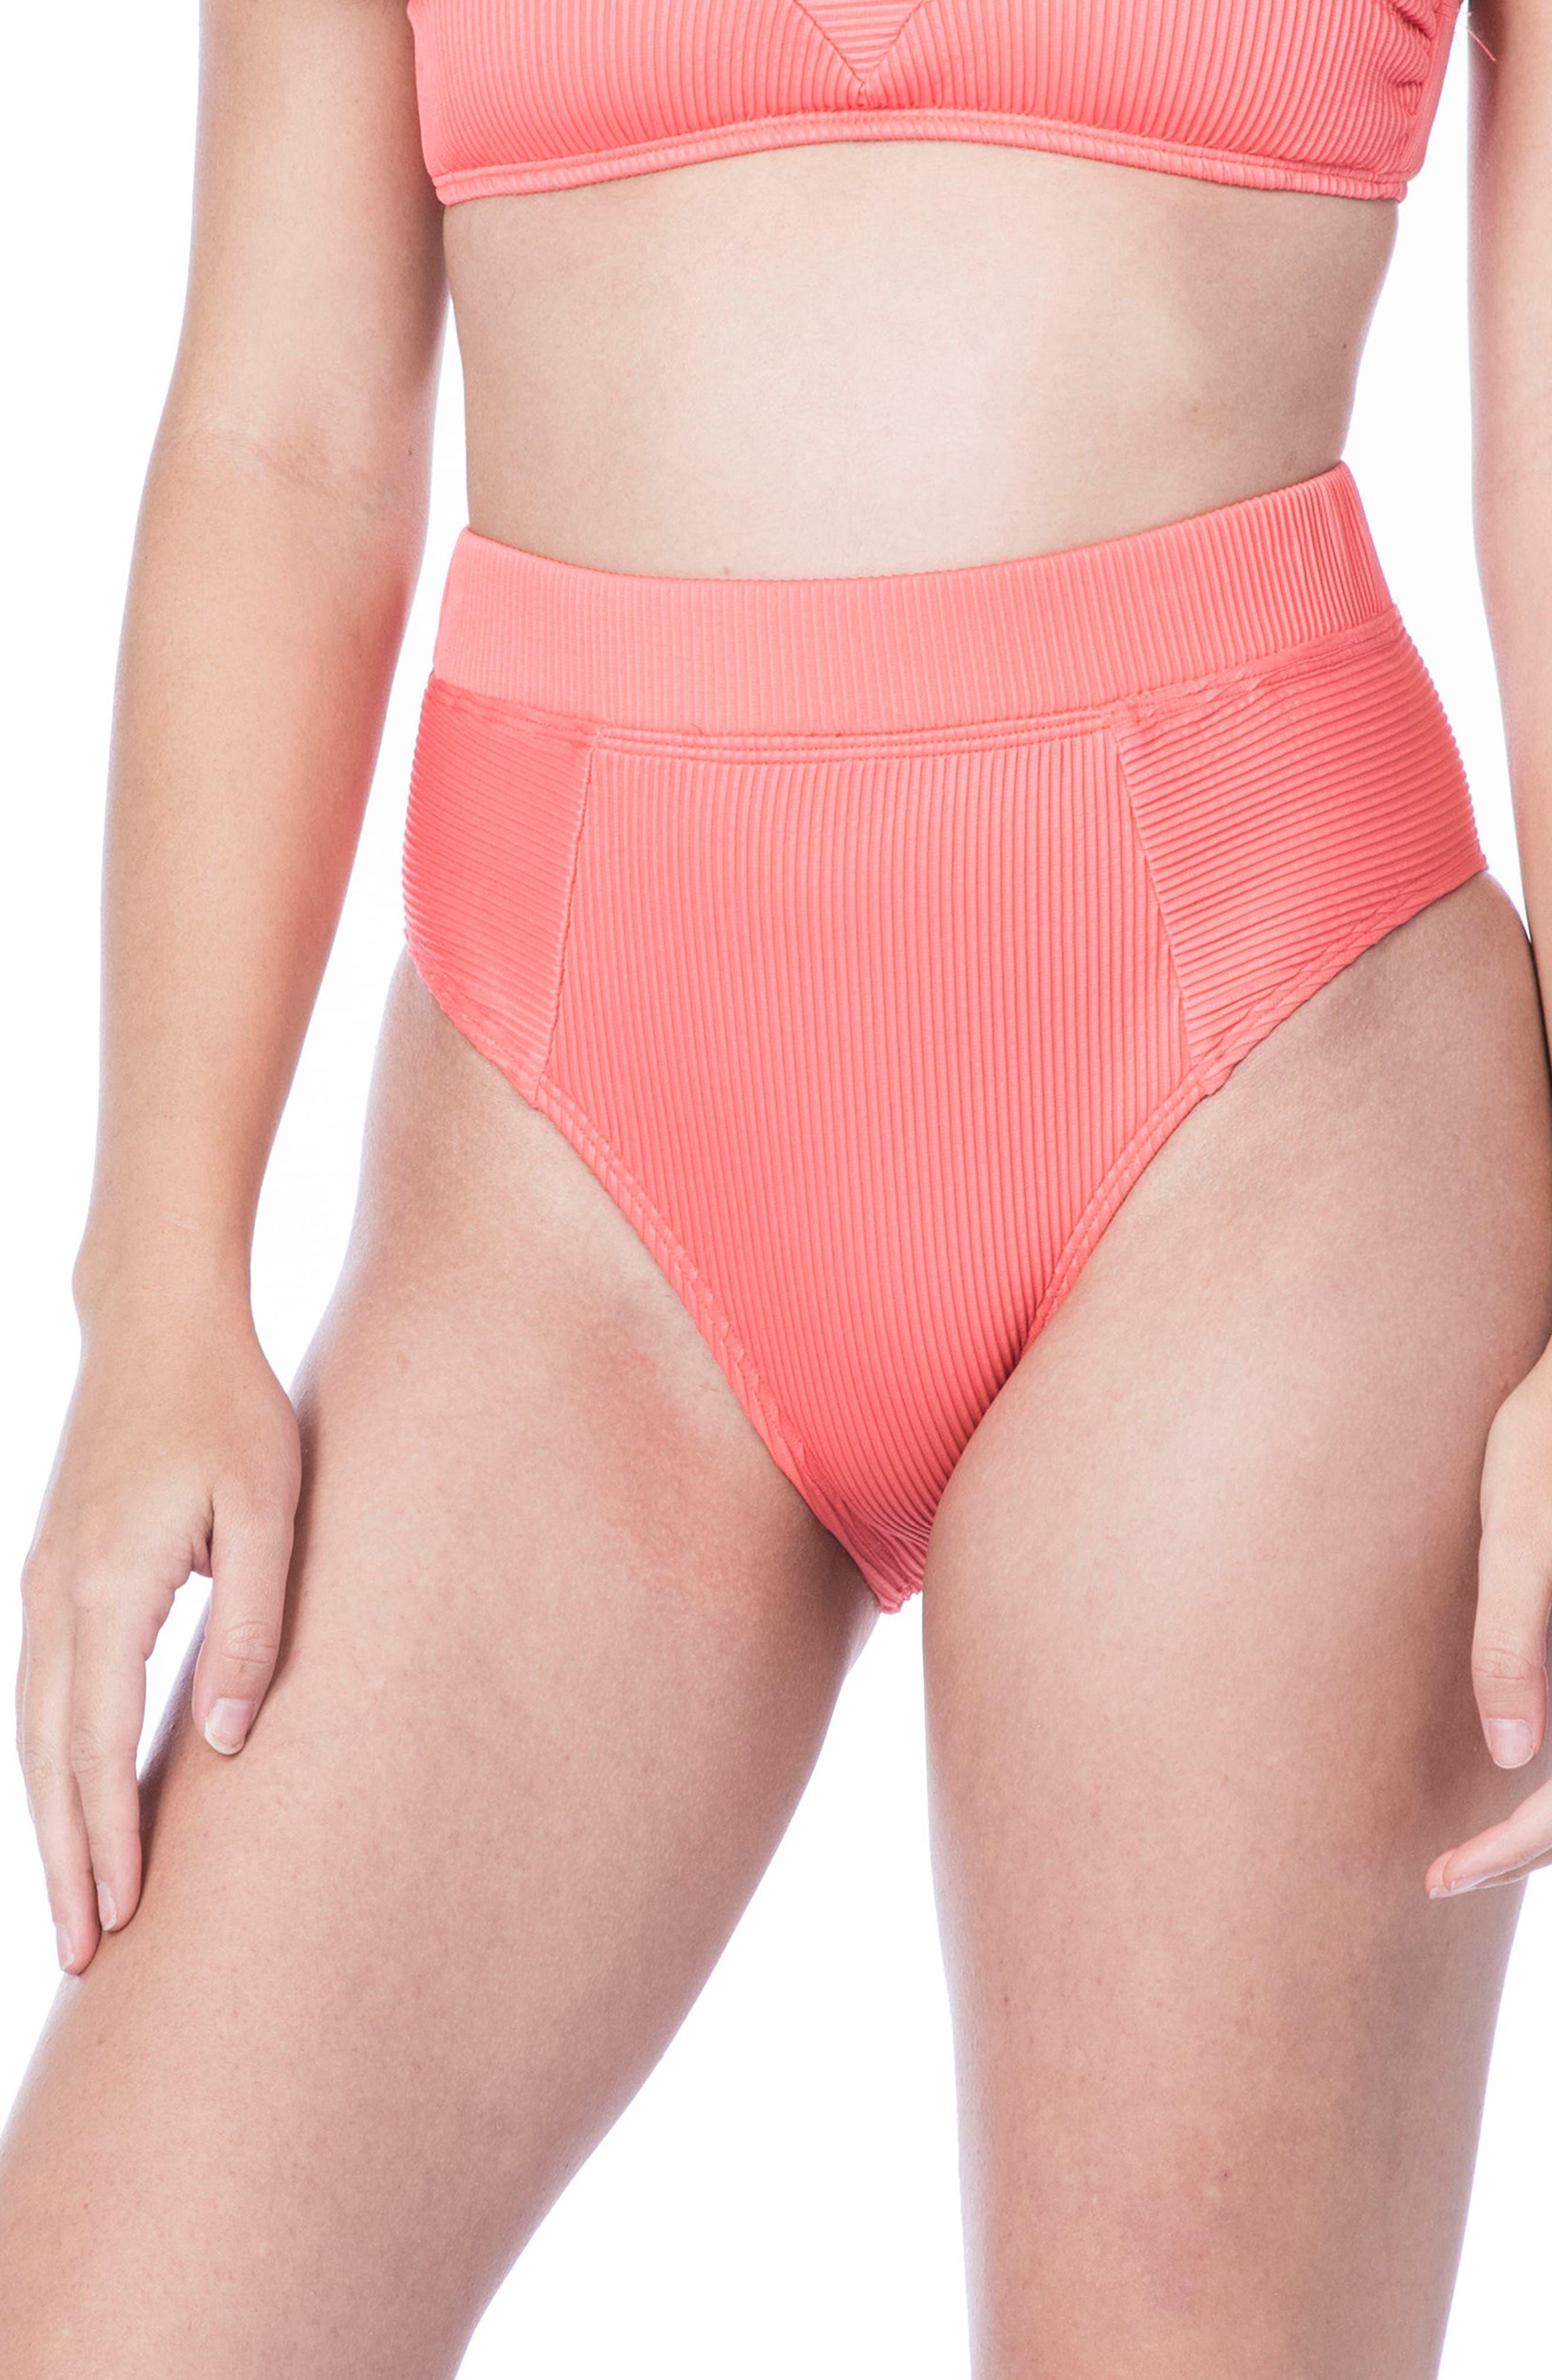 Rib-Thym High-Waist Bikini Bottoms,                             Main thumbnail 1, color,                             950